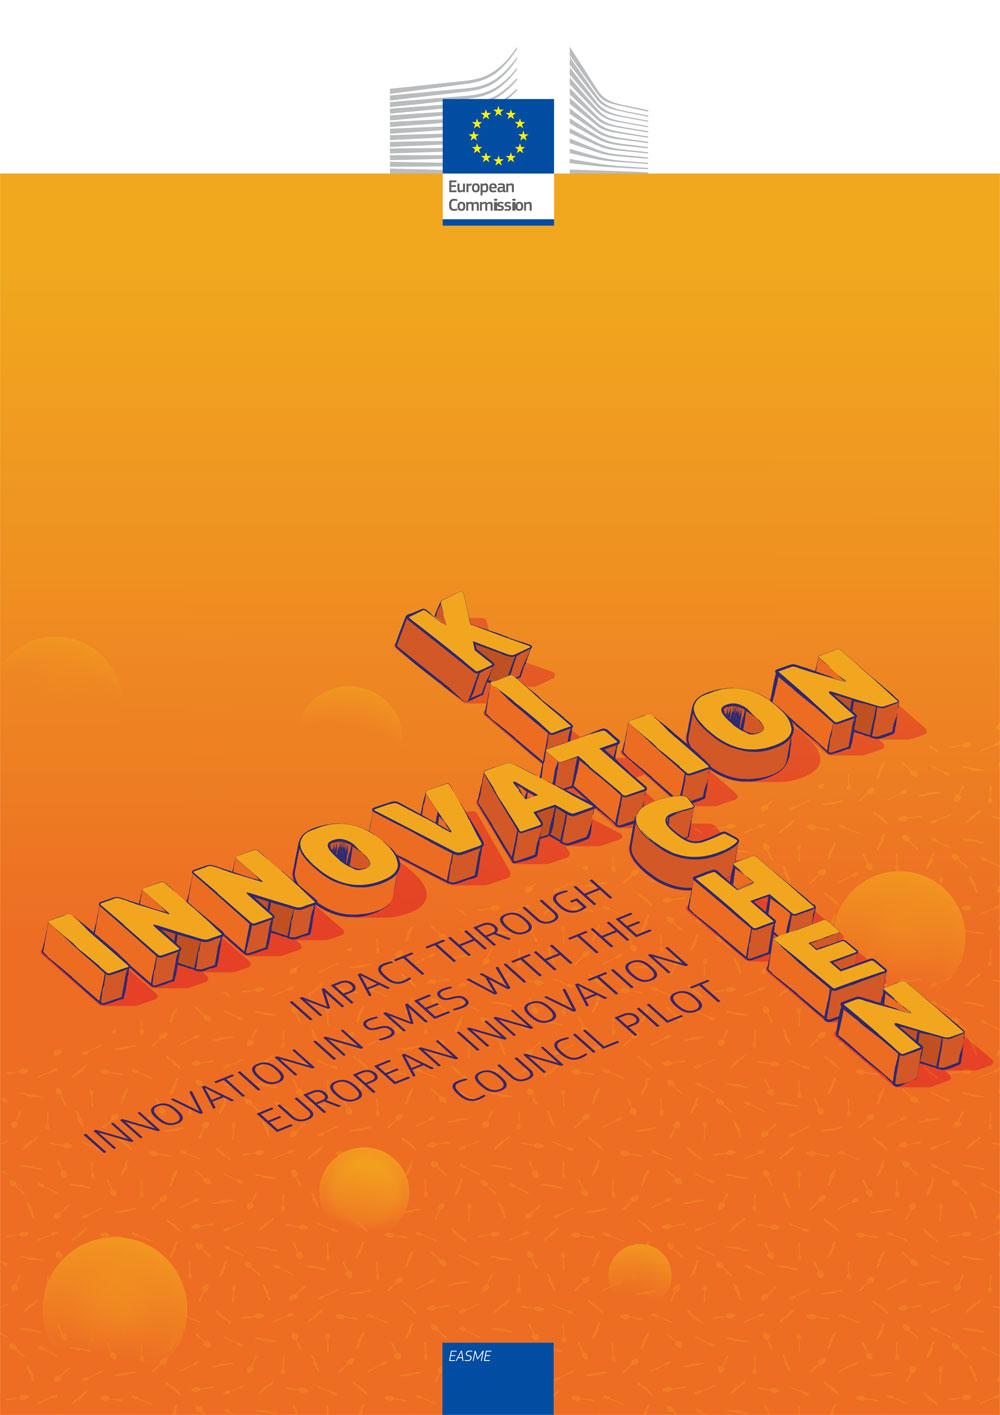 Innovation kitchen